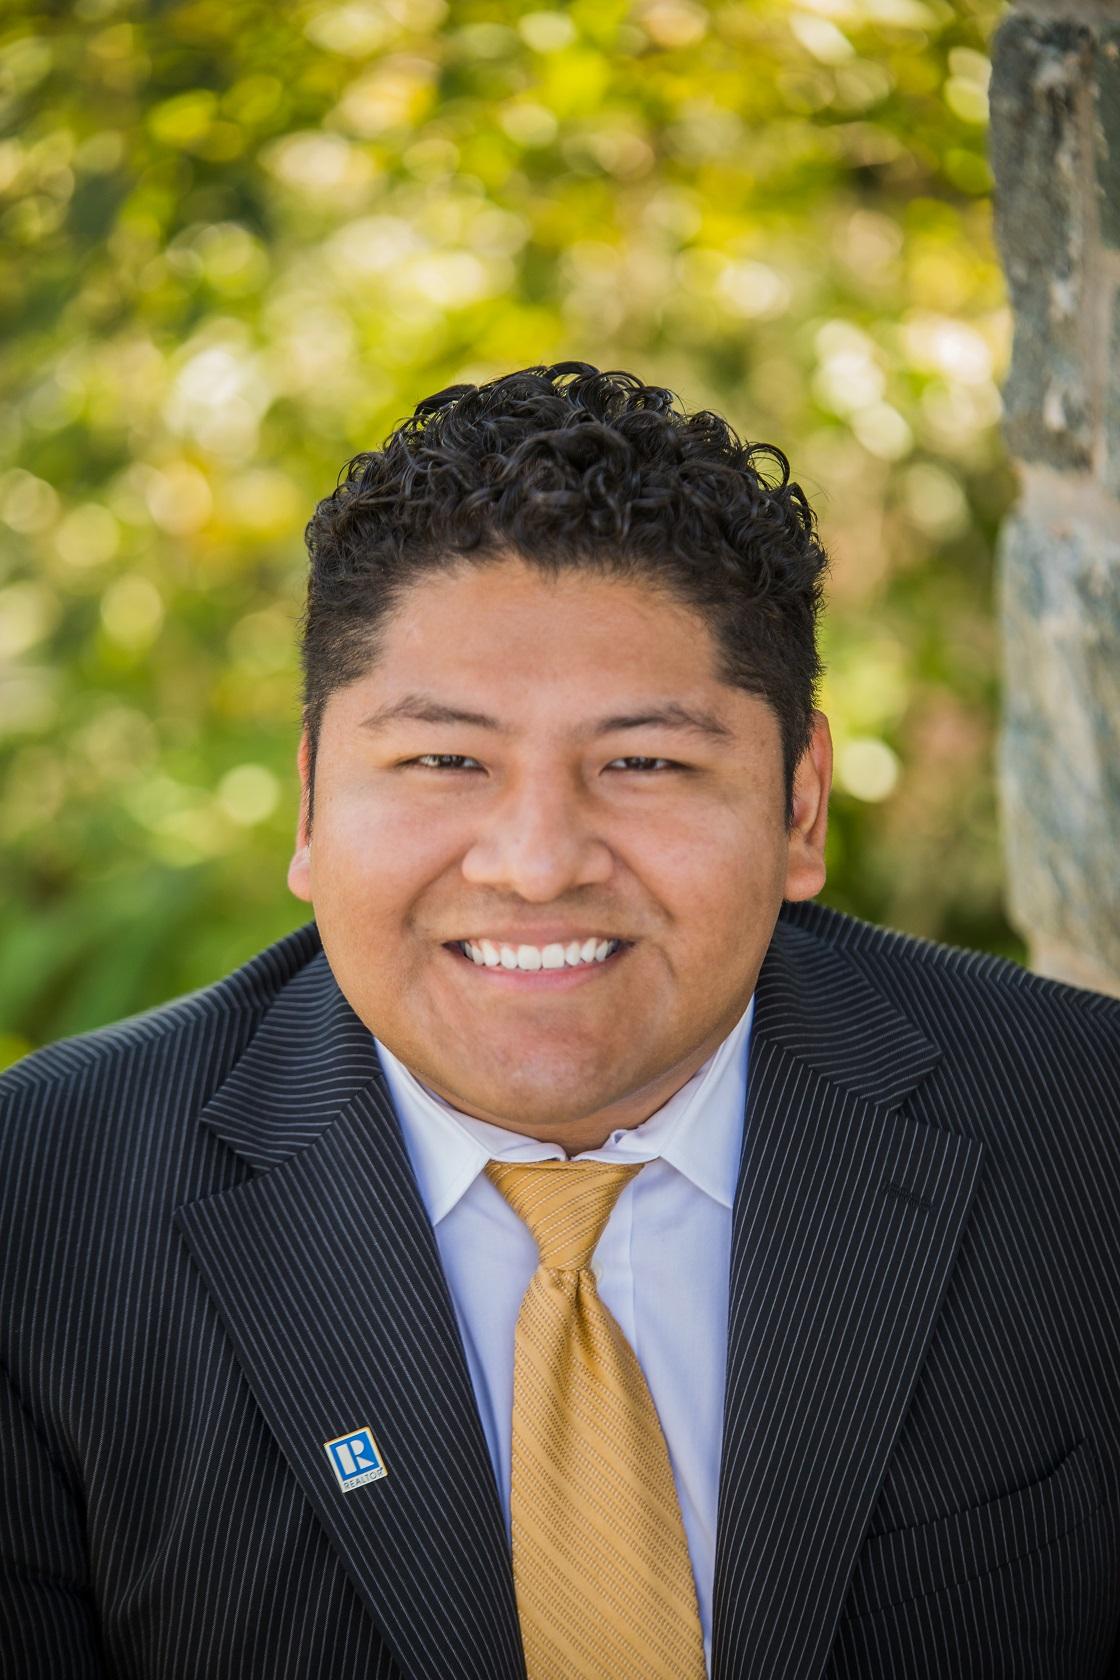 Juan undefined Rodriguez